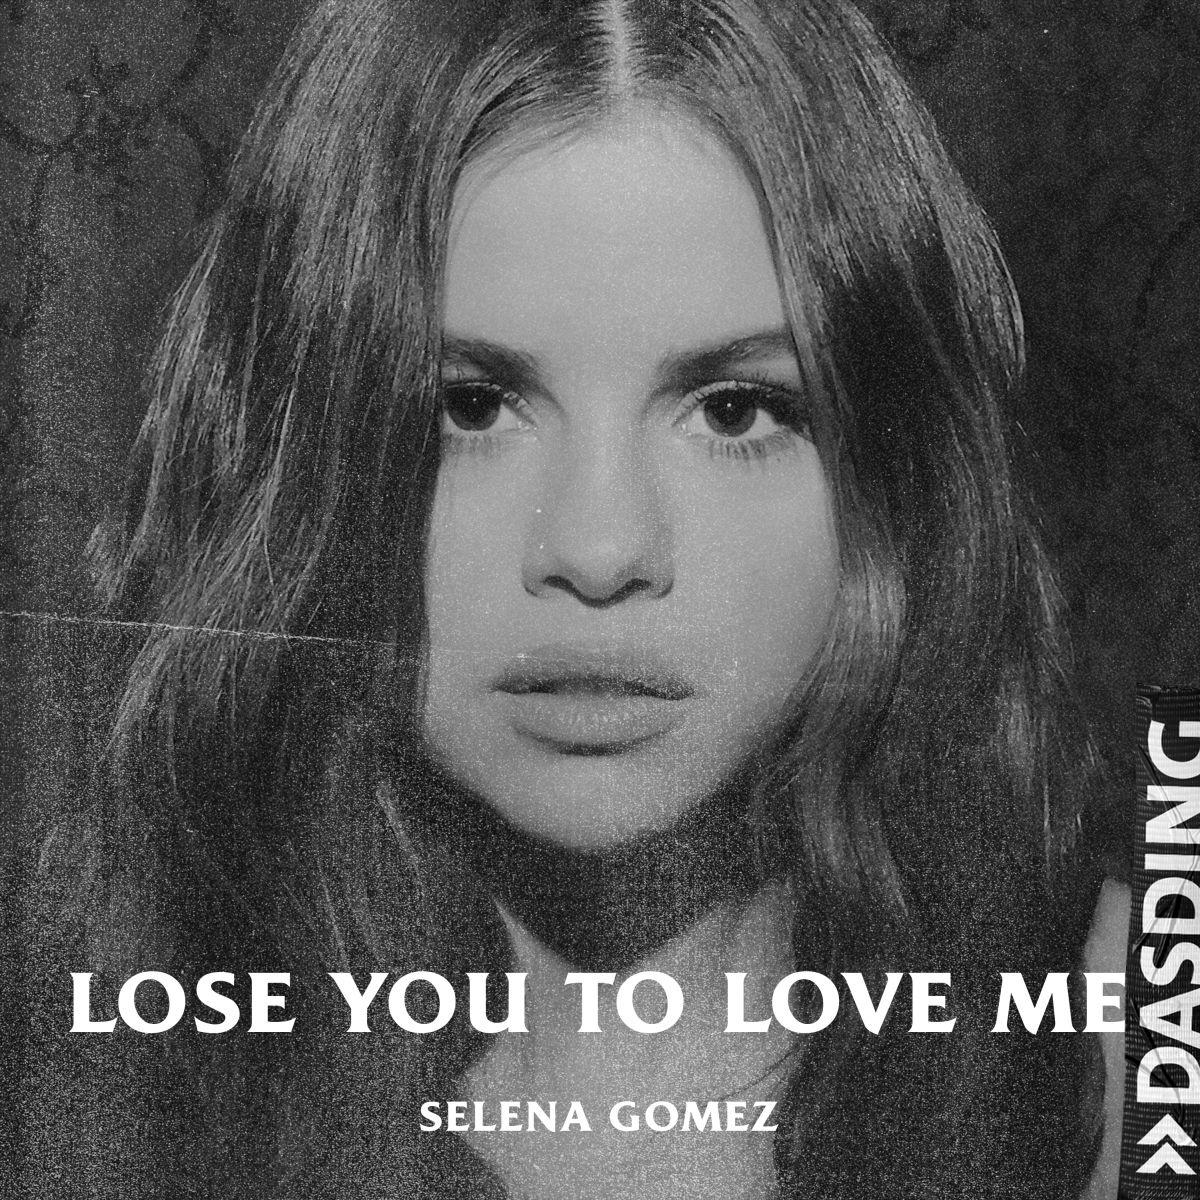 Lose you to love me (Foto: Selena Gomez)